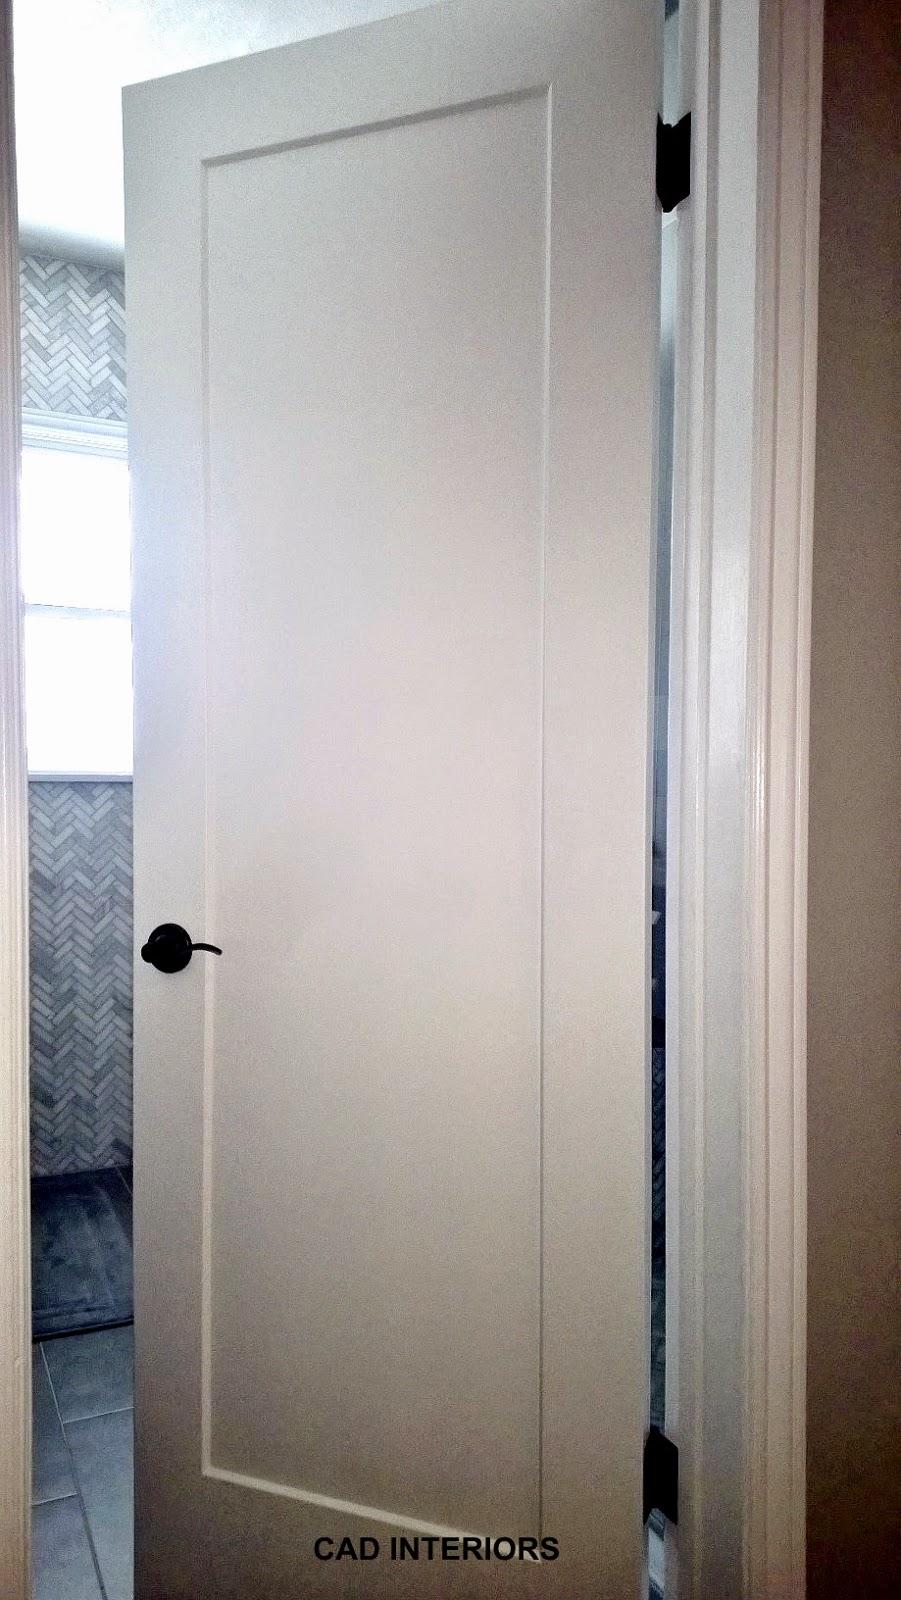 Bathroom Doors cad interiors - affordable stylish interiors